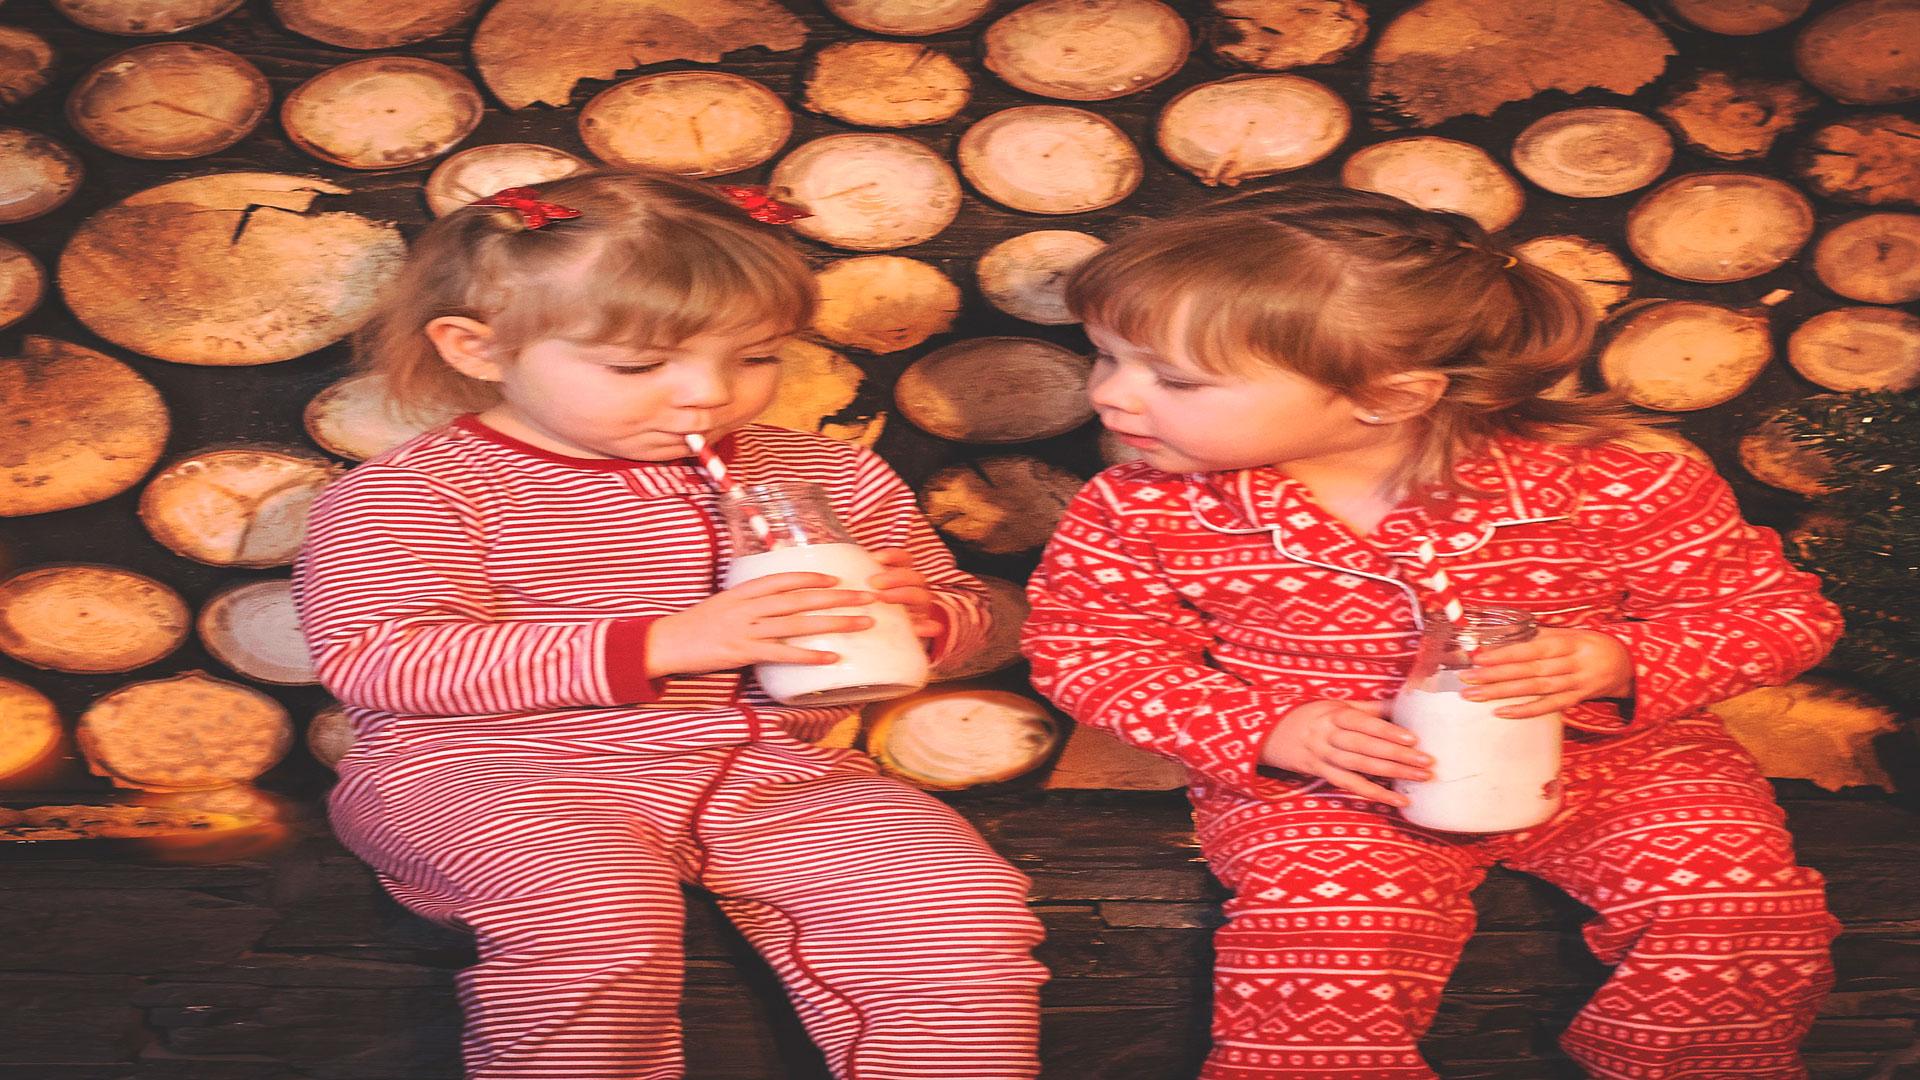 La-importancia-de-tomar-leche-desde-la-infancia-hasta-la-etapa-adulta-1920